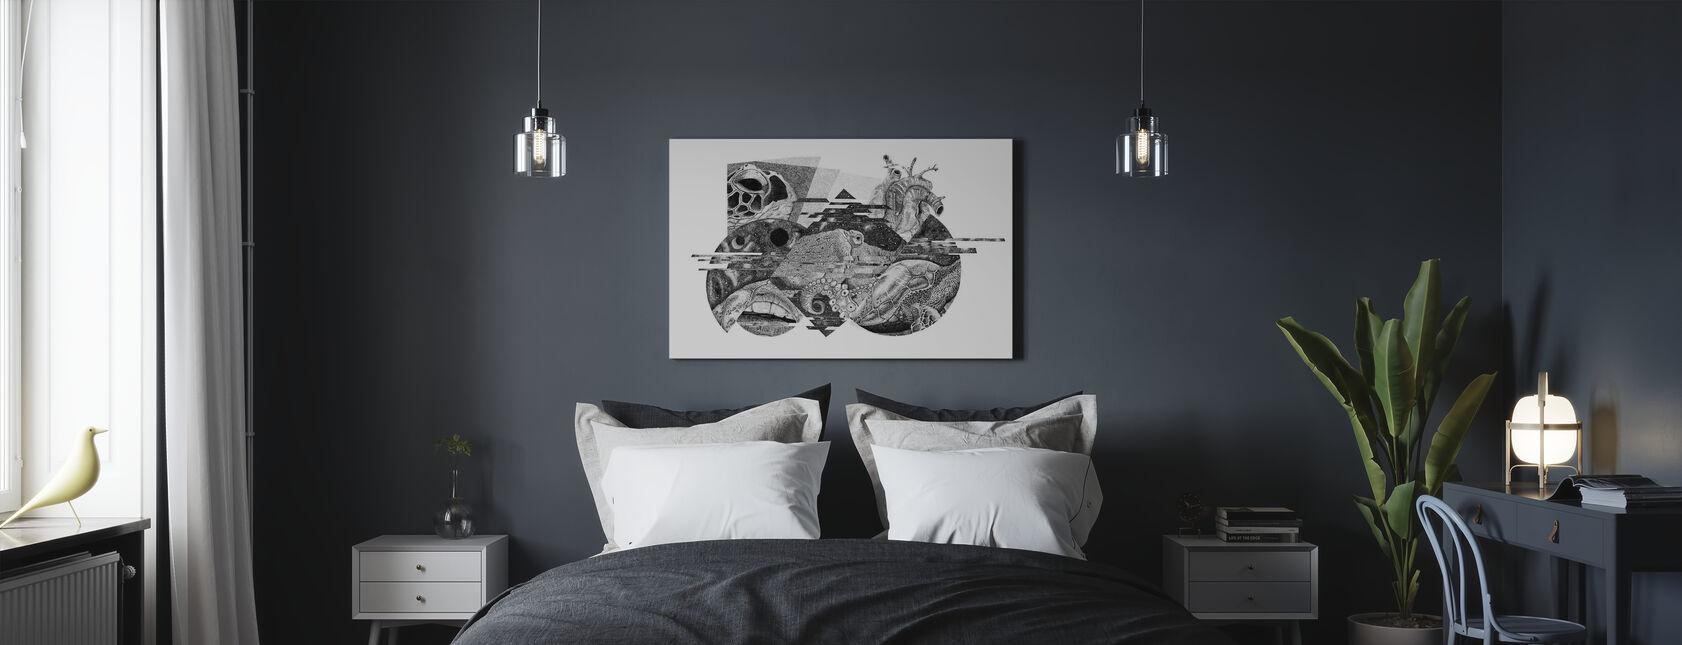 Interrupted Universe VI - Canvas print - Bedroom